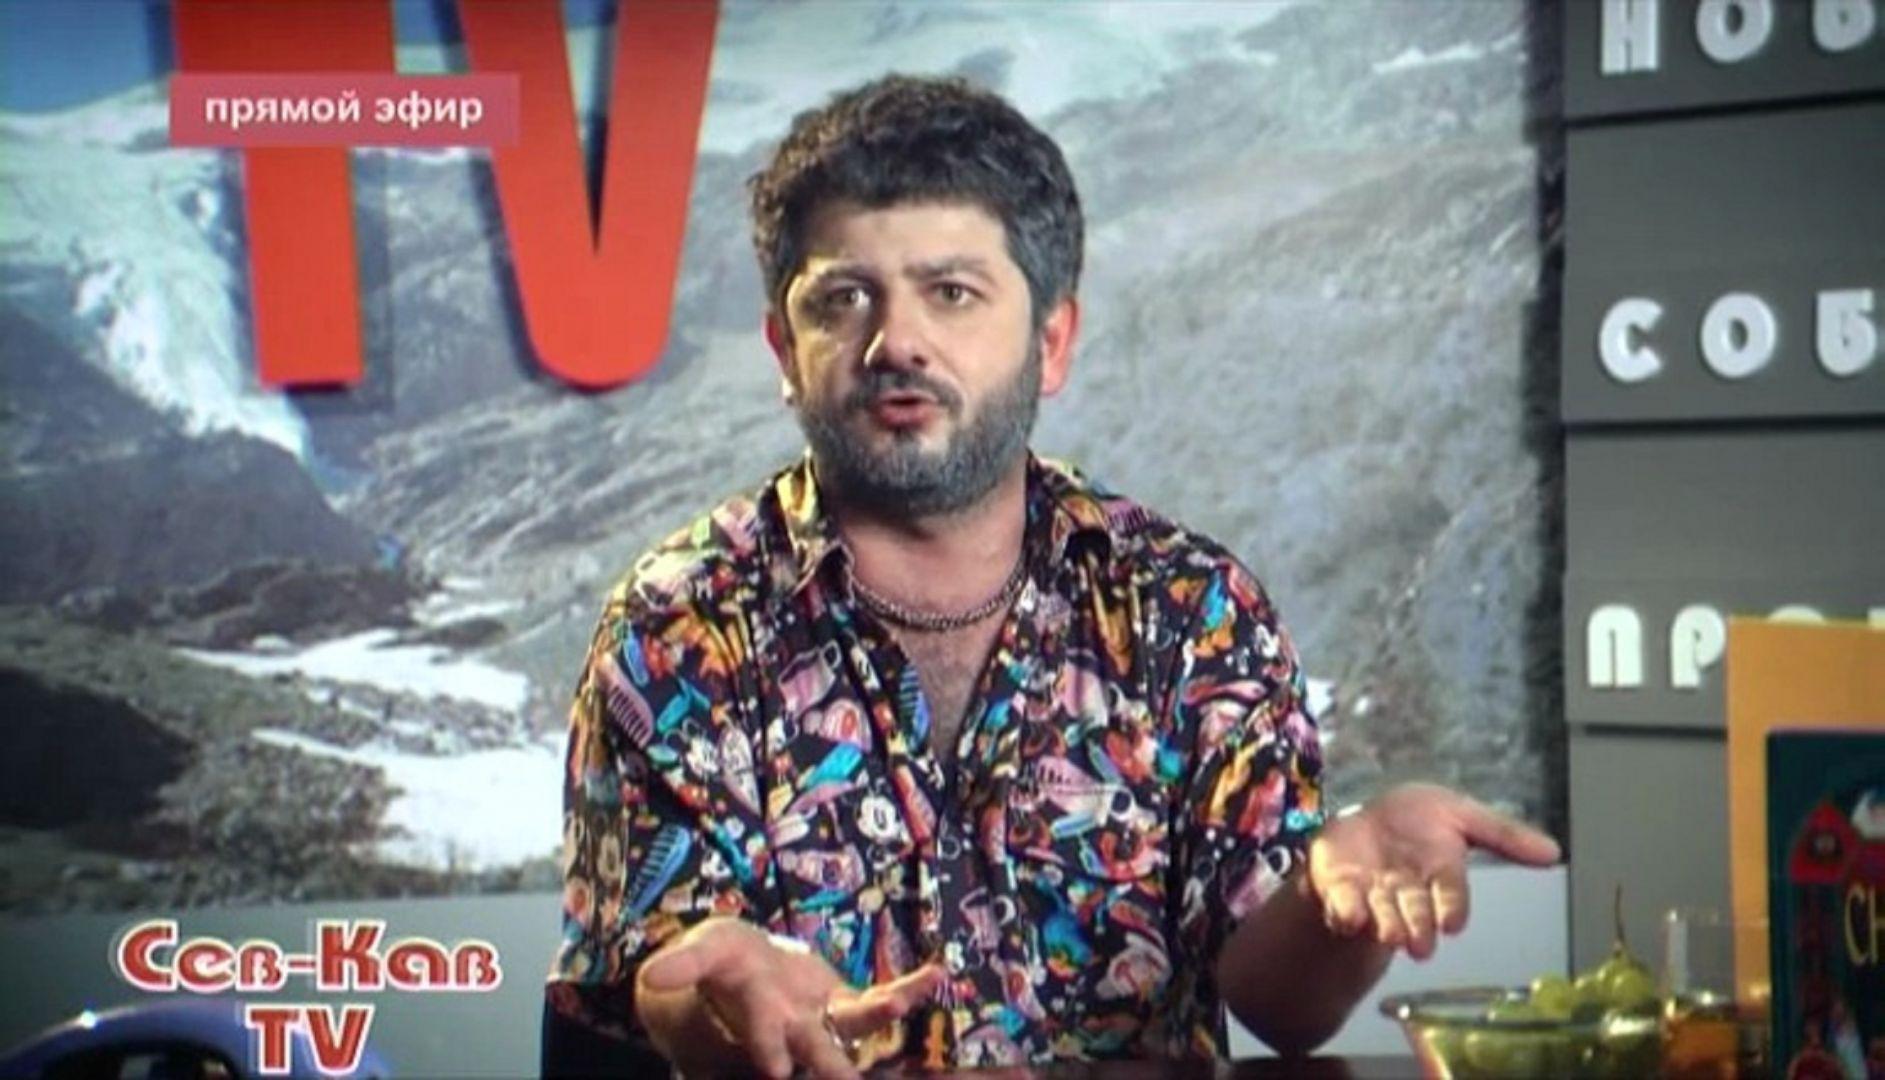 Новое шоу снимают про «короля Пятигорска» Жорика Вартанова